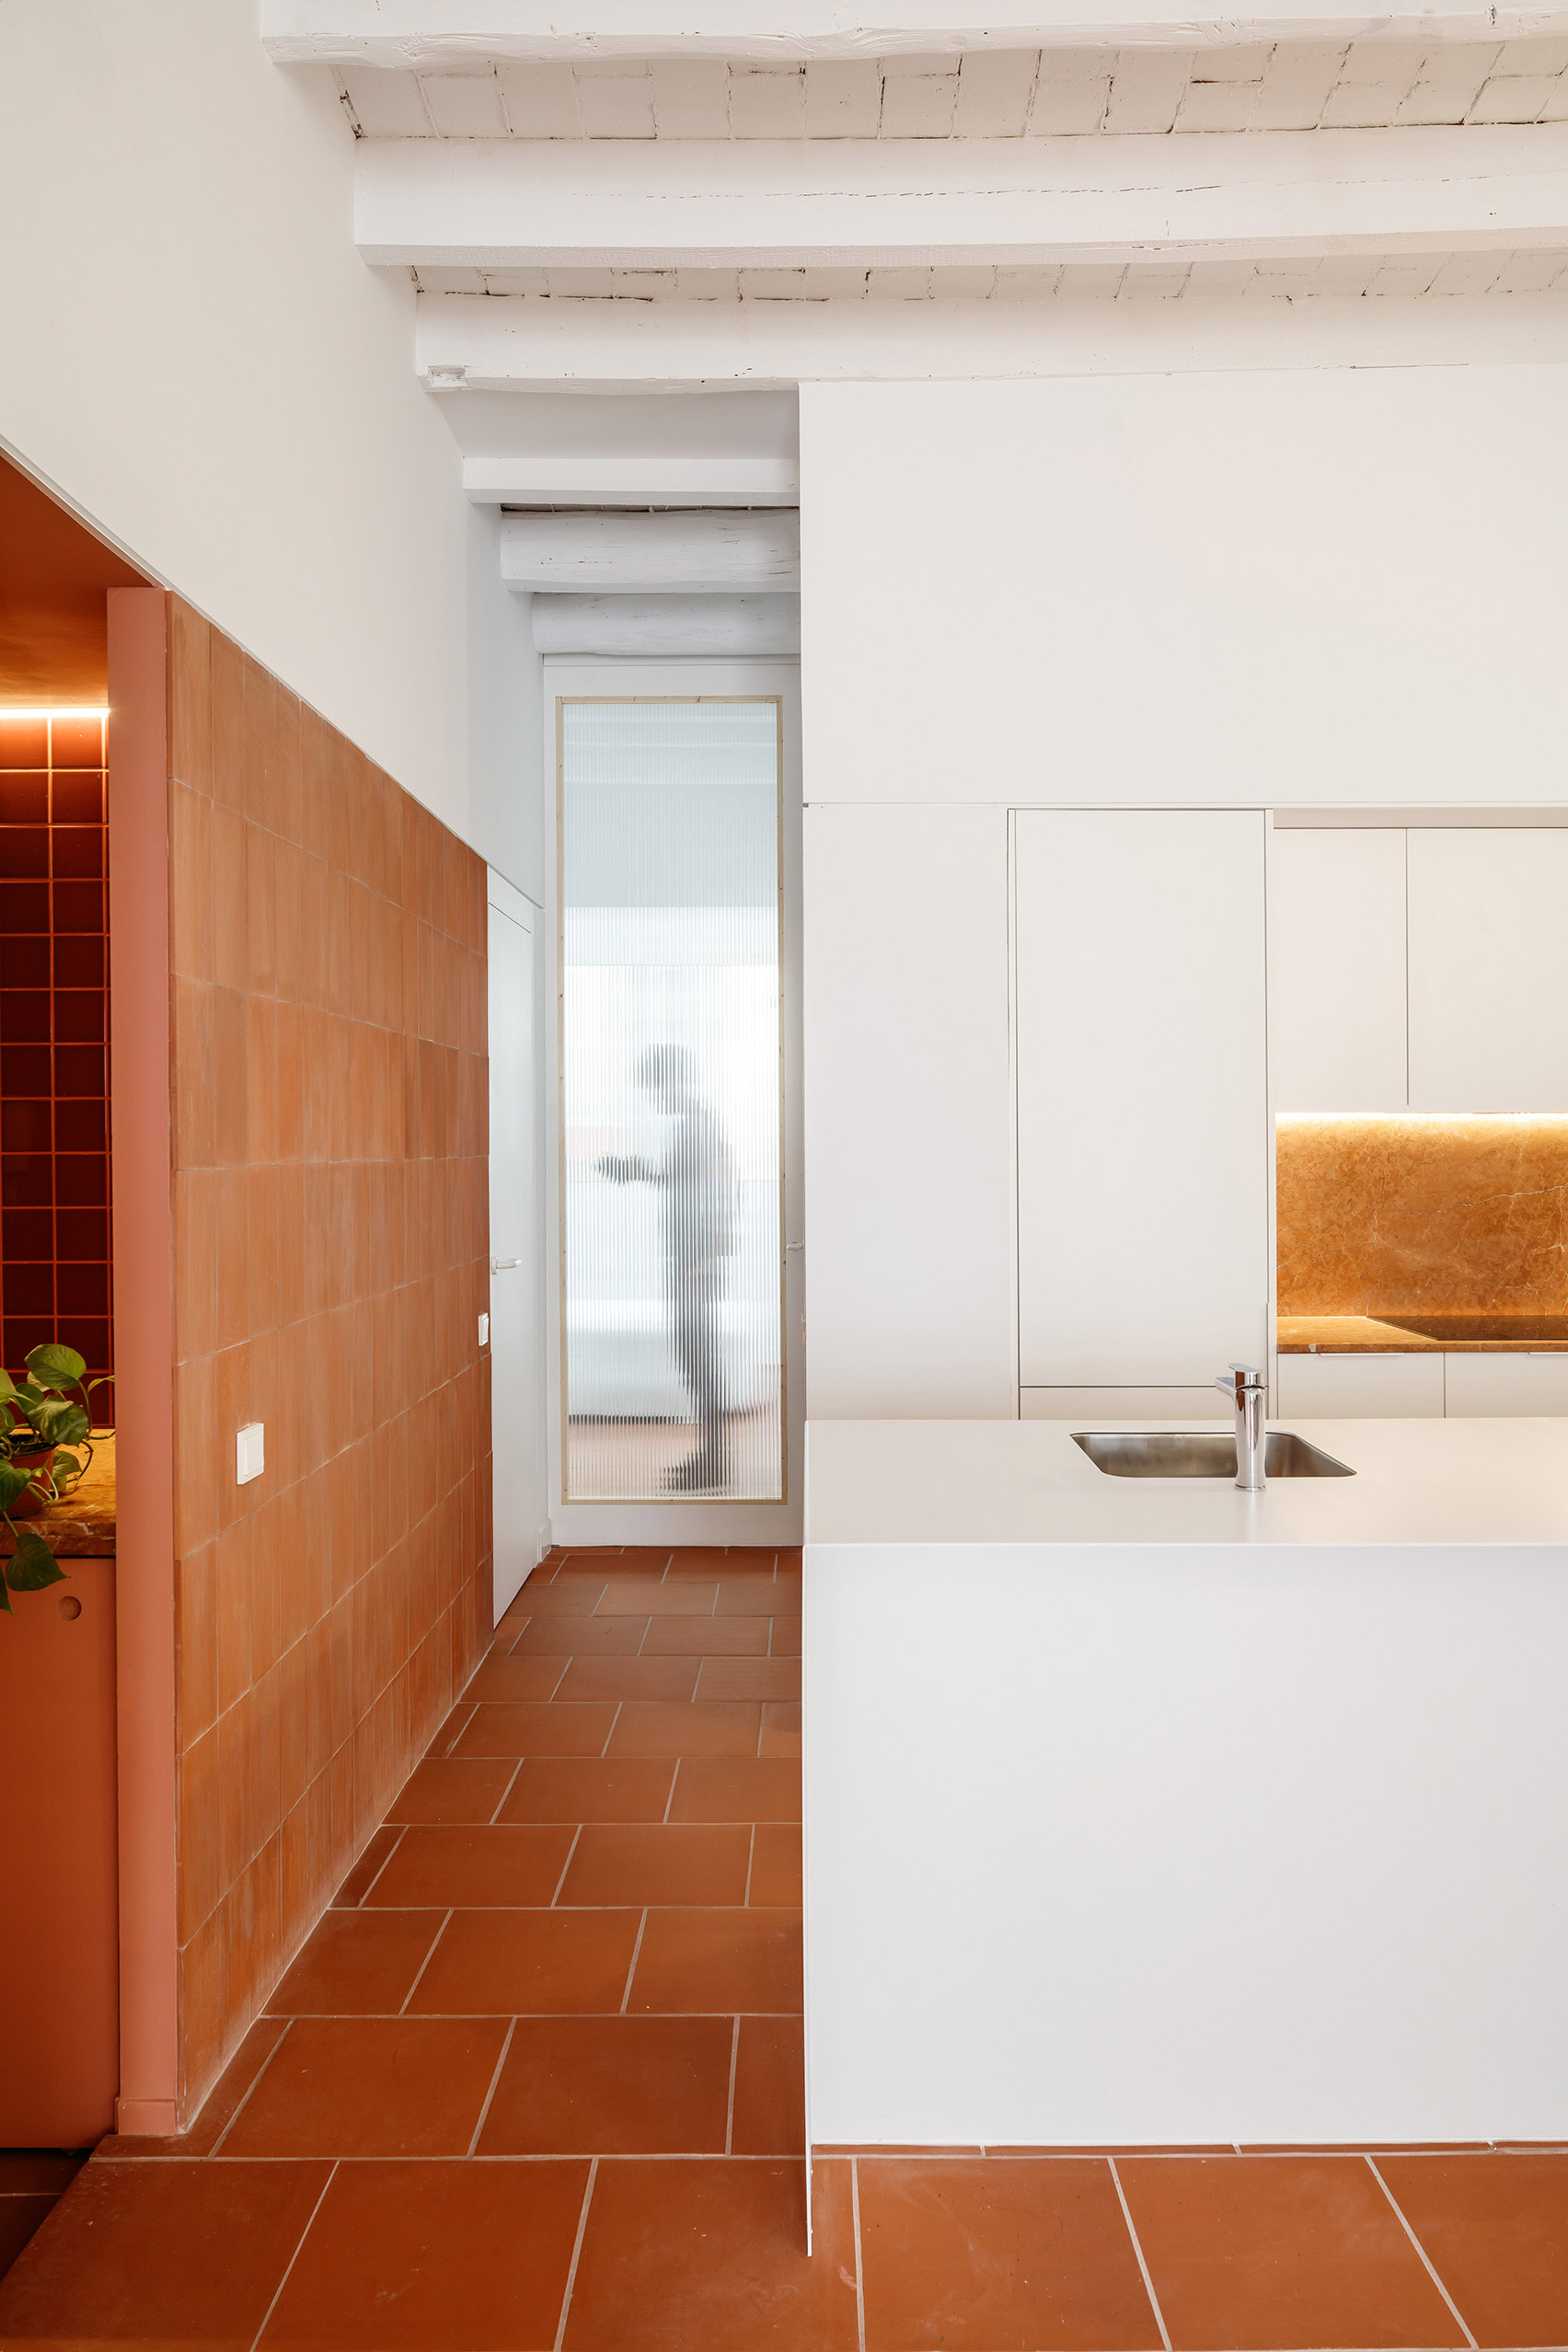 Interiors of La Odette apartment by Crü